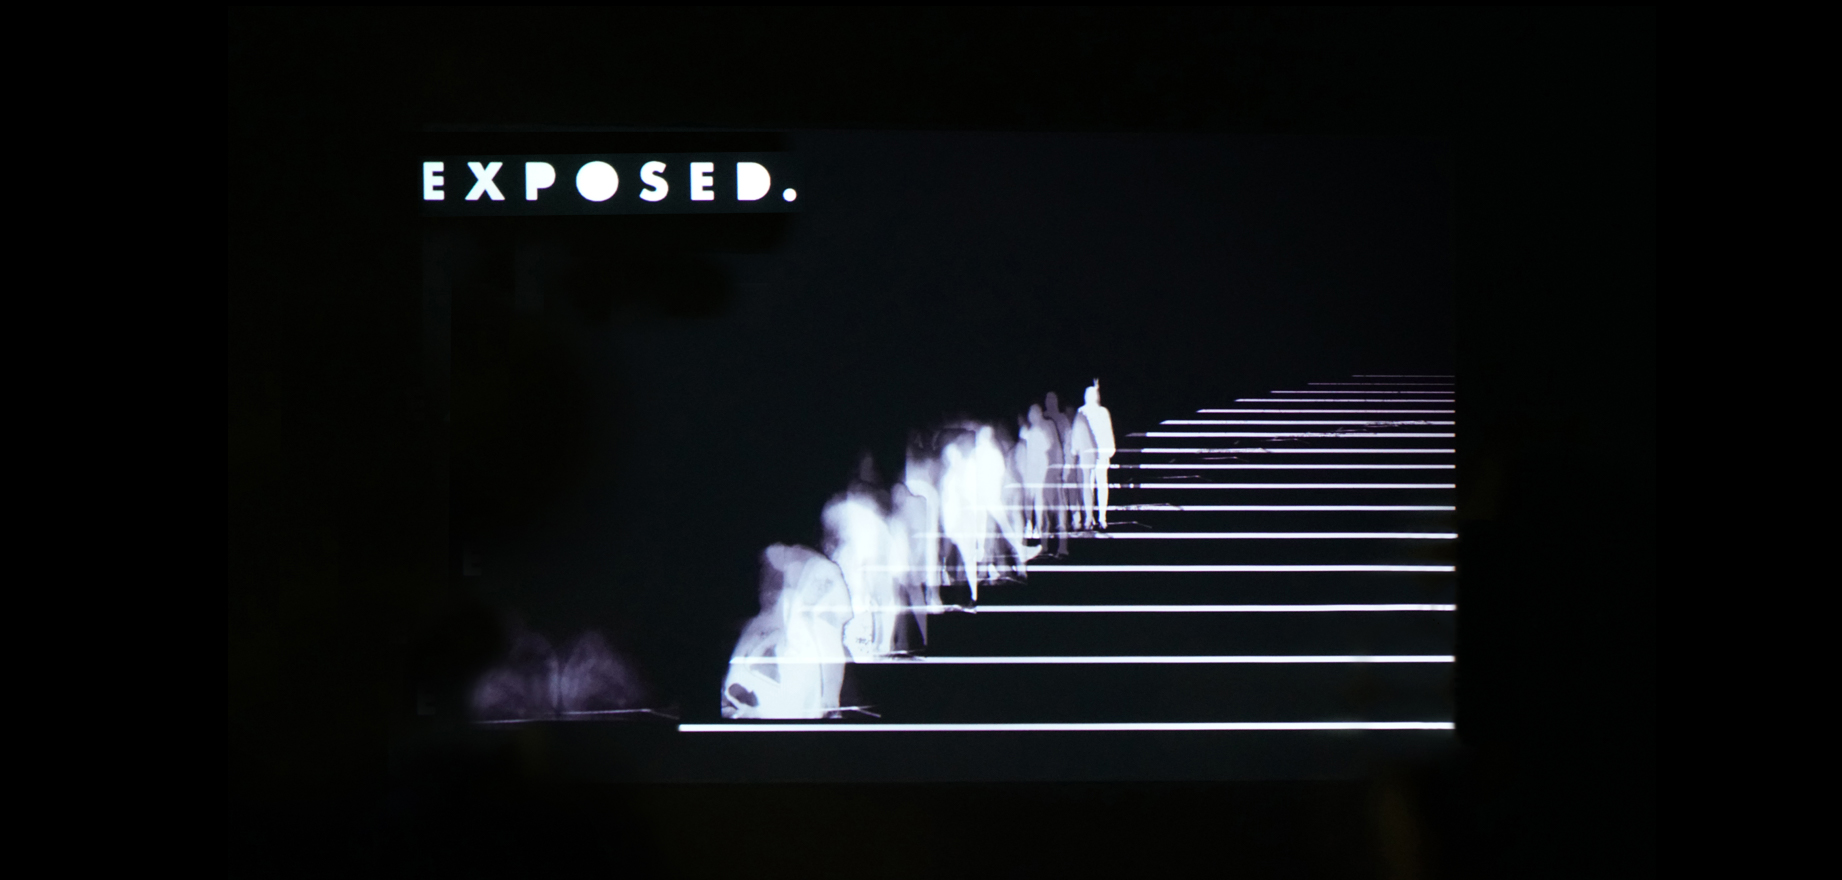 EXPOSED.